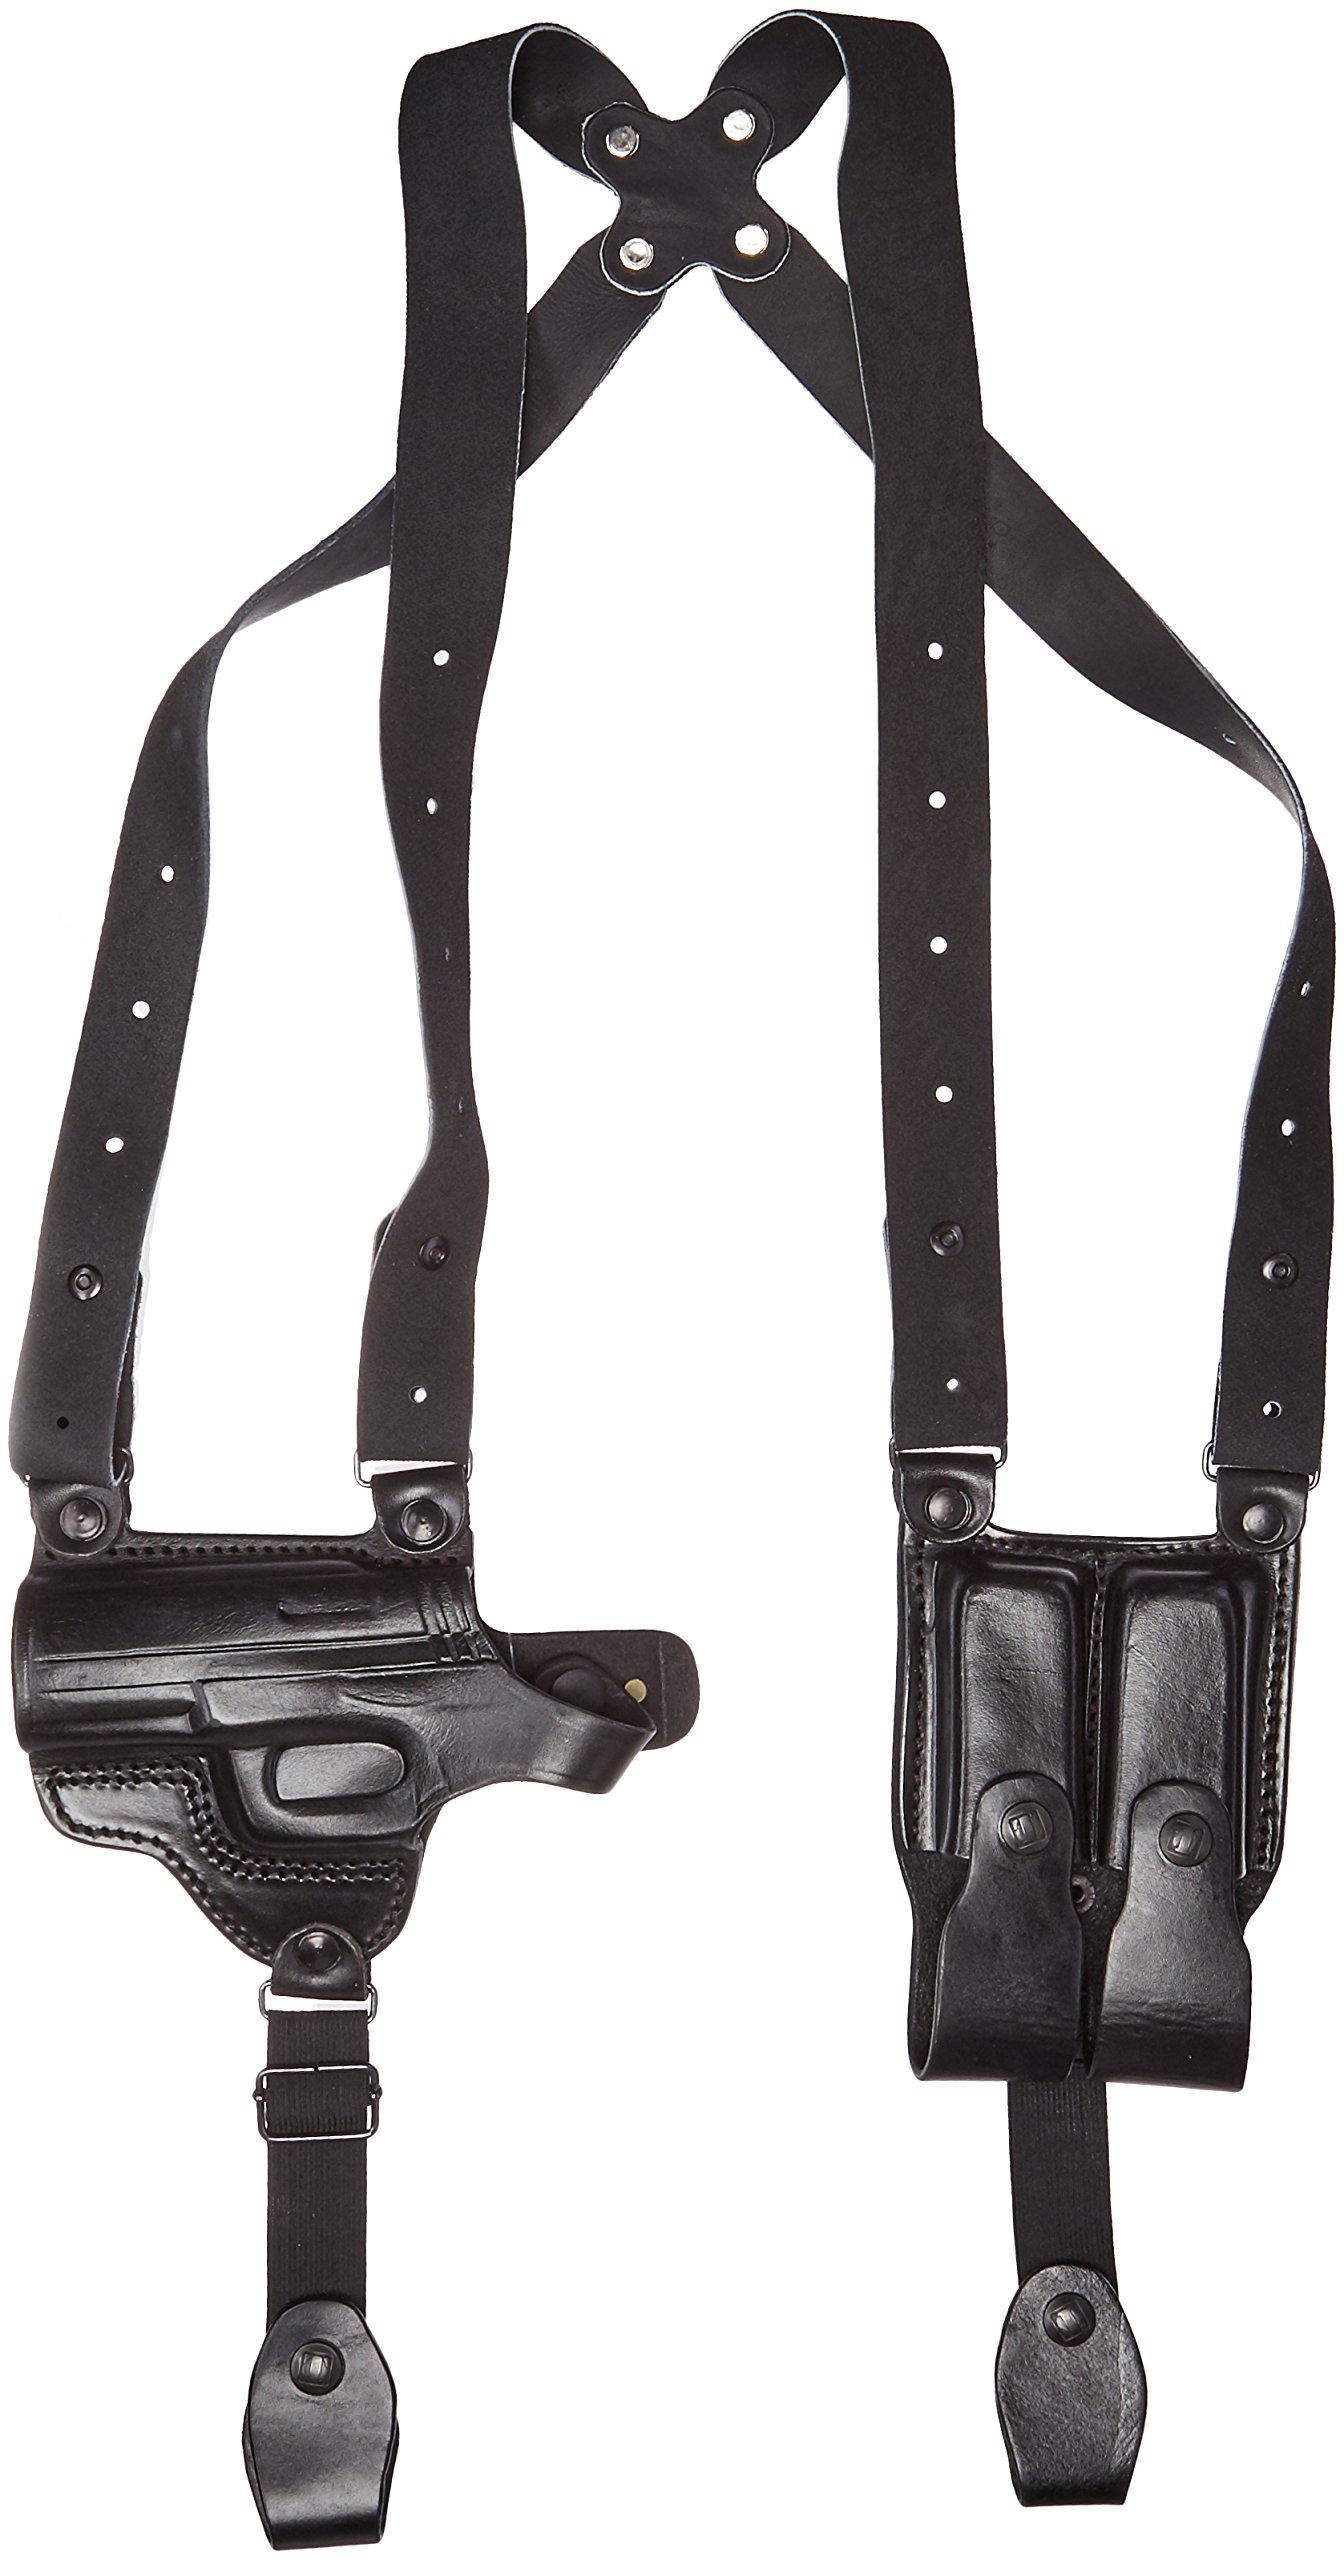 Tagua SH4-1106 Full Slide Shoulder Holster, Walther P99, Black, Left Hand by Tagua (Image #1)